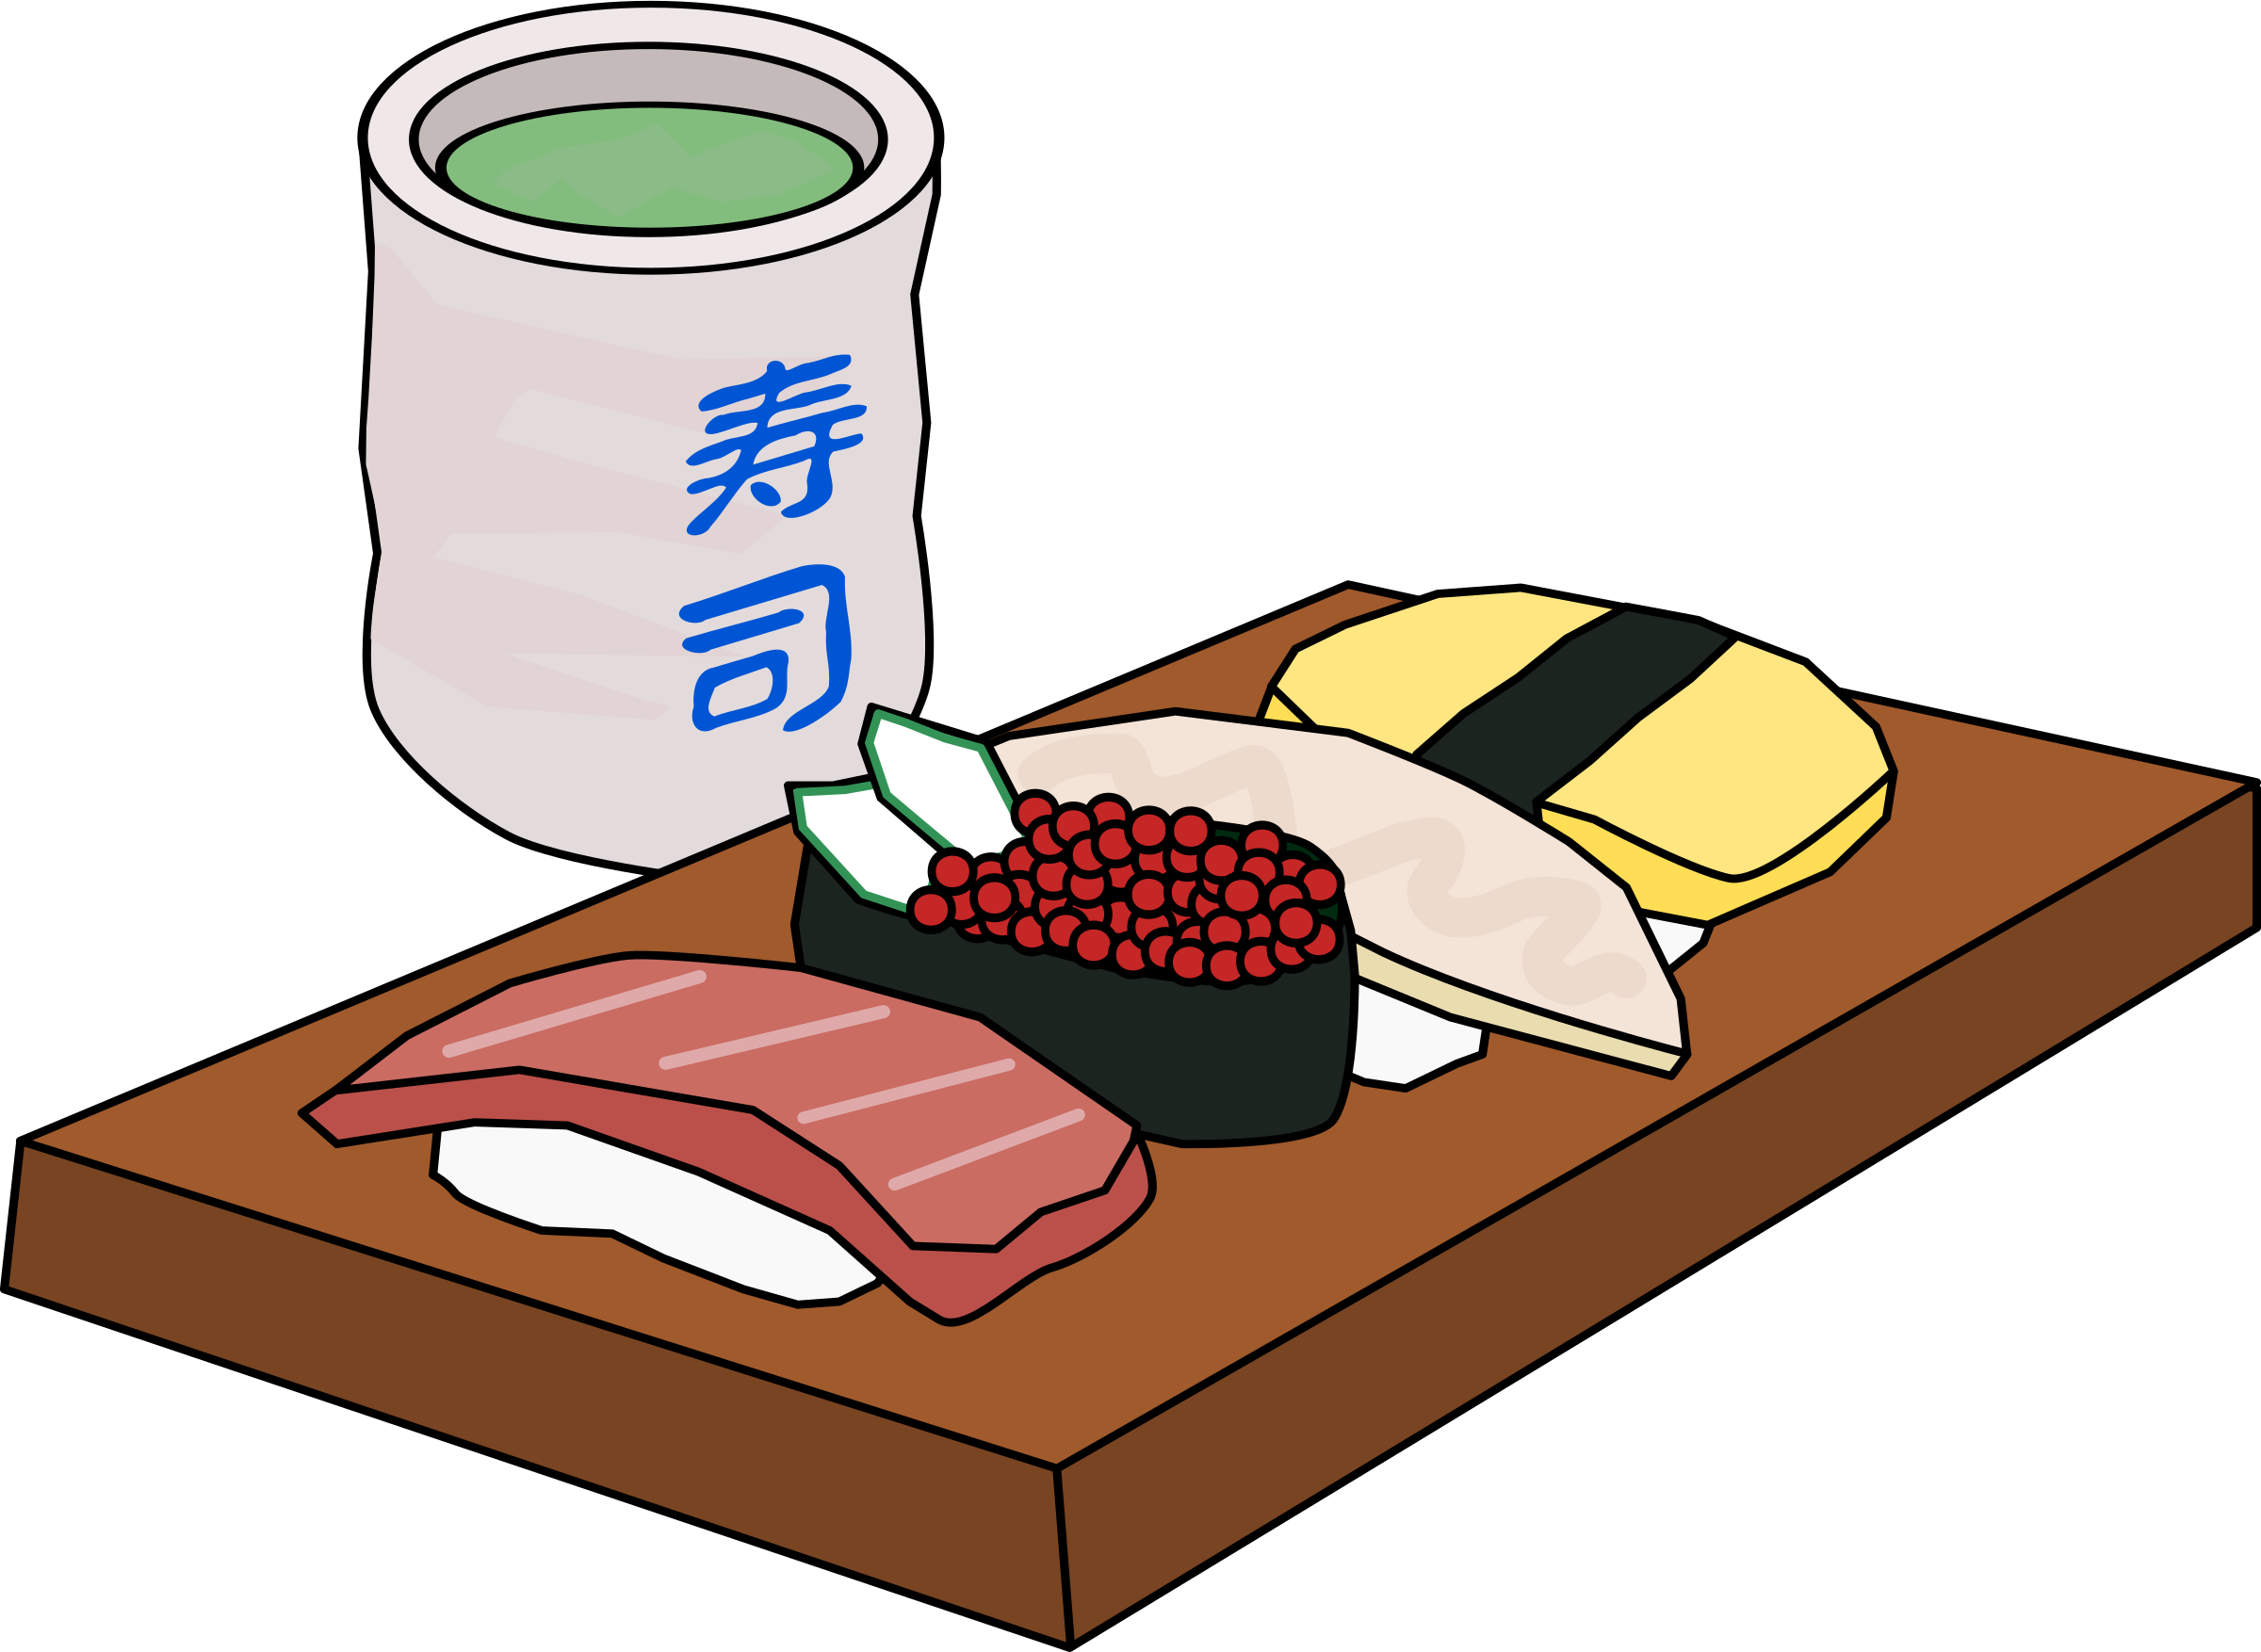 banner transparent stock And green tea big. Sushi clipart